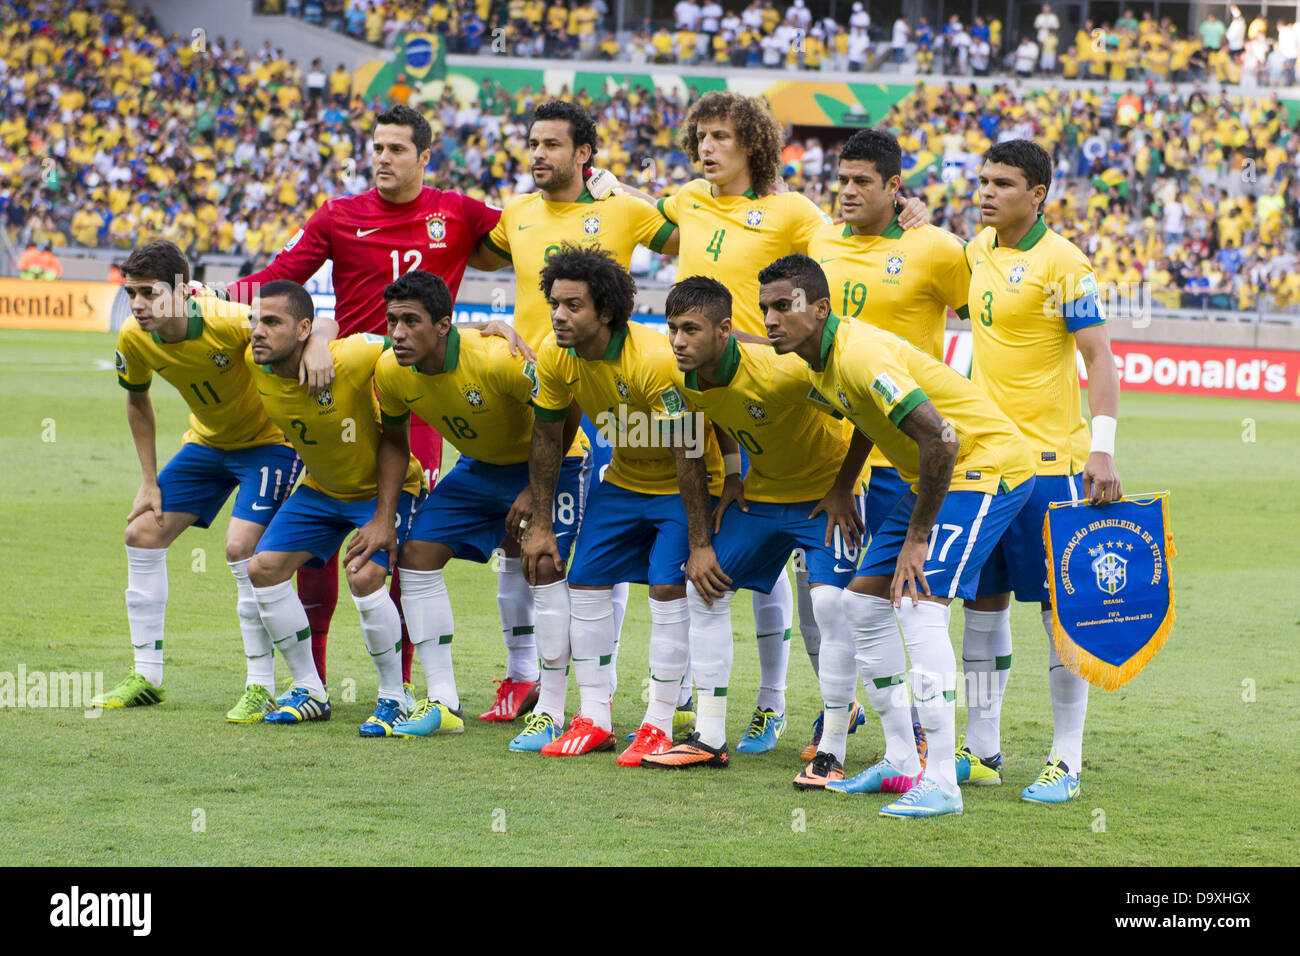 Neymar And Oscar Imágenes De Stock   Neymar And Oscar Fotos De Stock ... a37e83b35f925